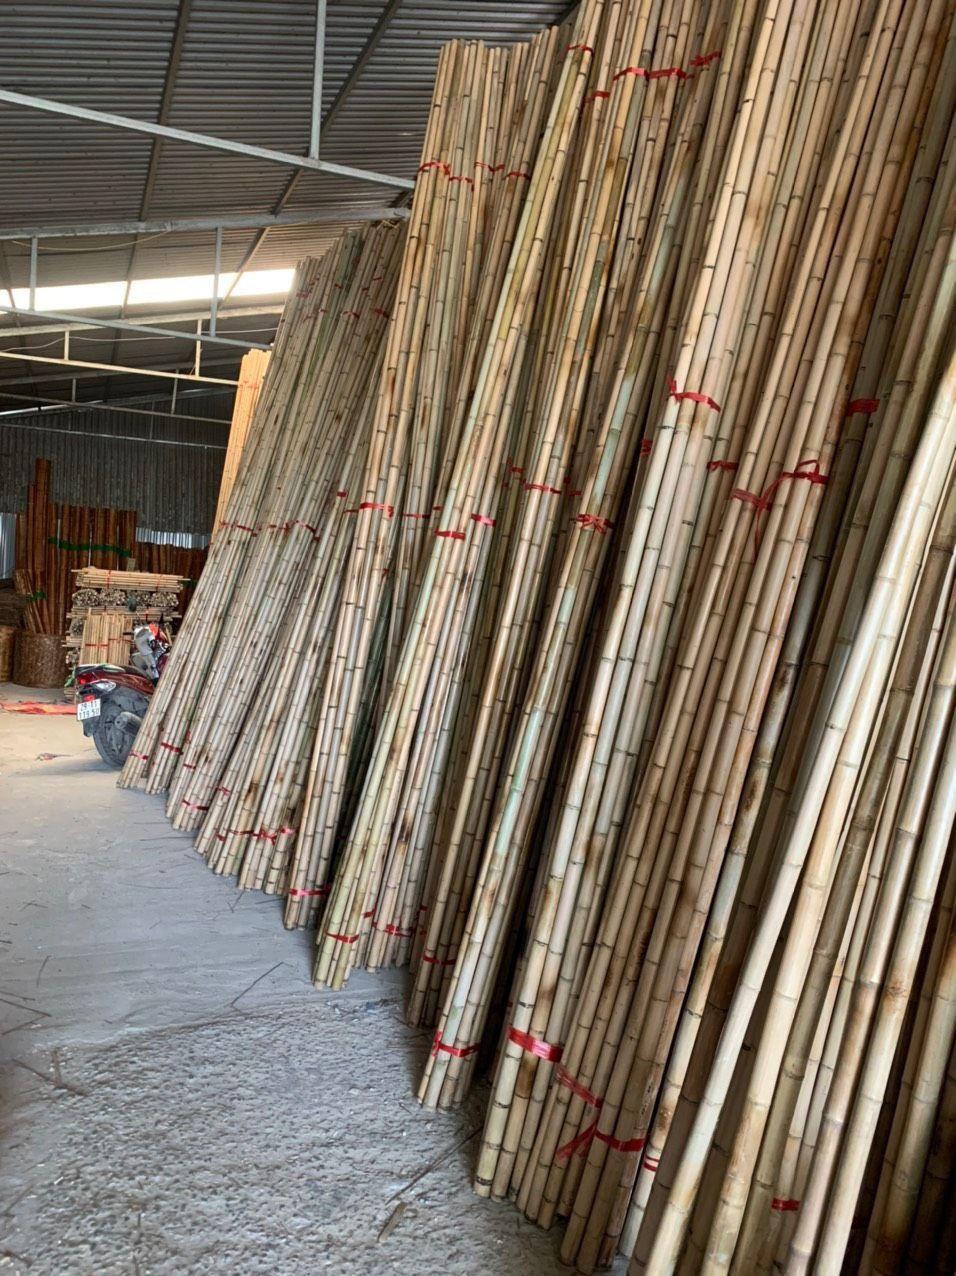 High Quality Bamboo Cane